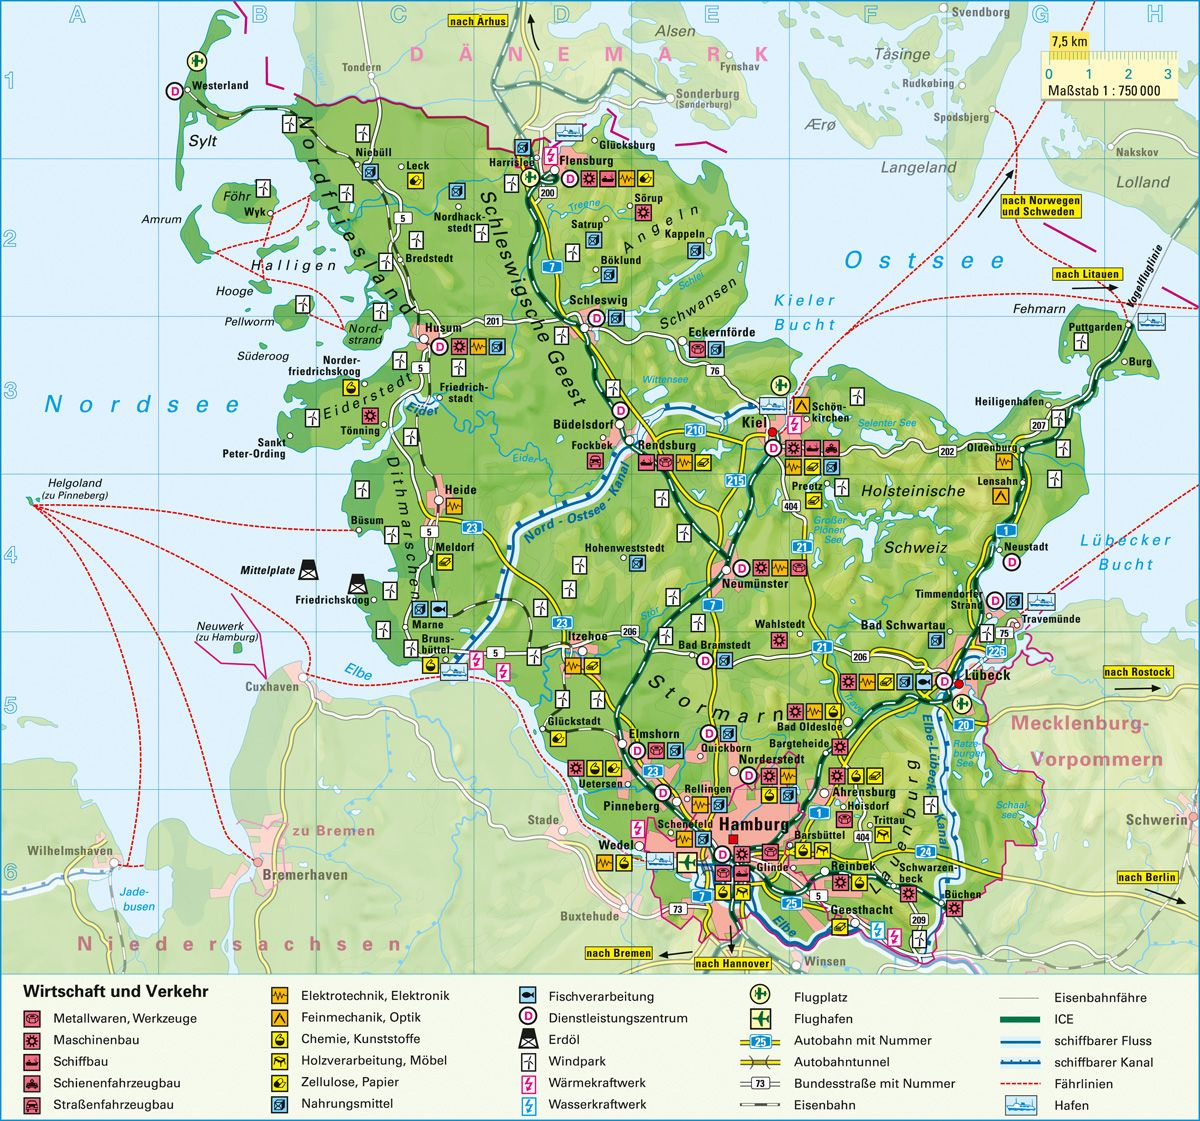 Schleswig Holstein Karte.Schleswig Holstein Karte Holstein Karte Schleswig Sleeswijk